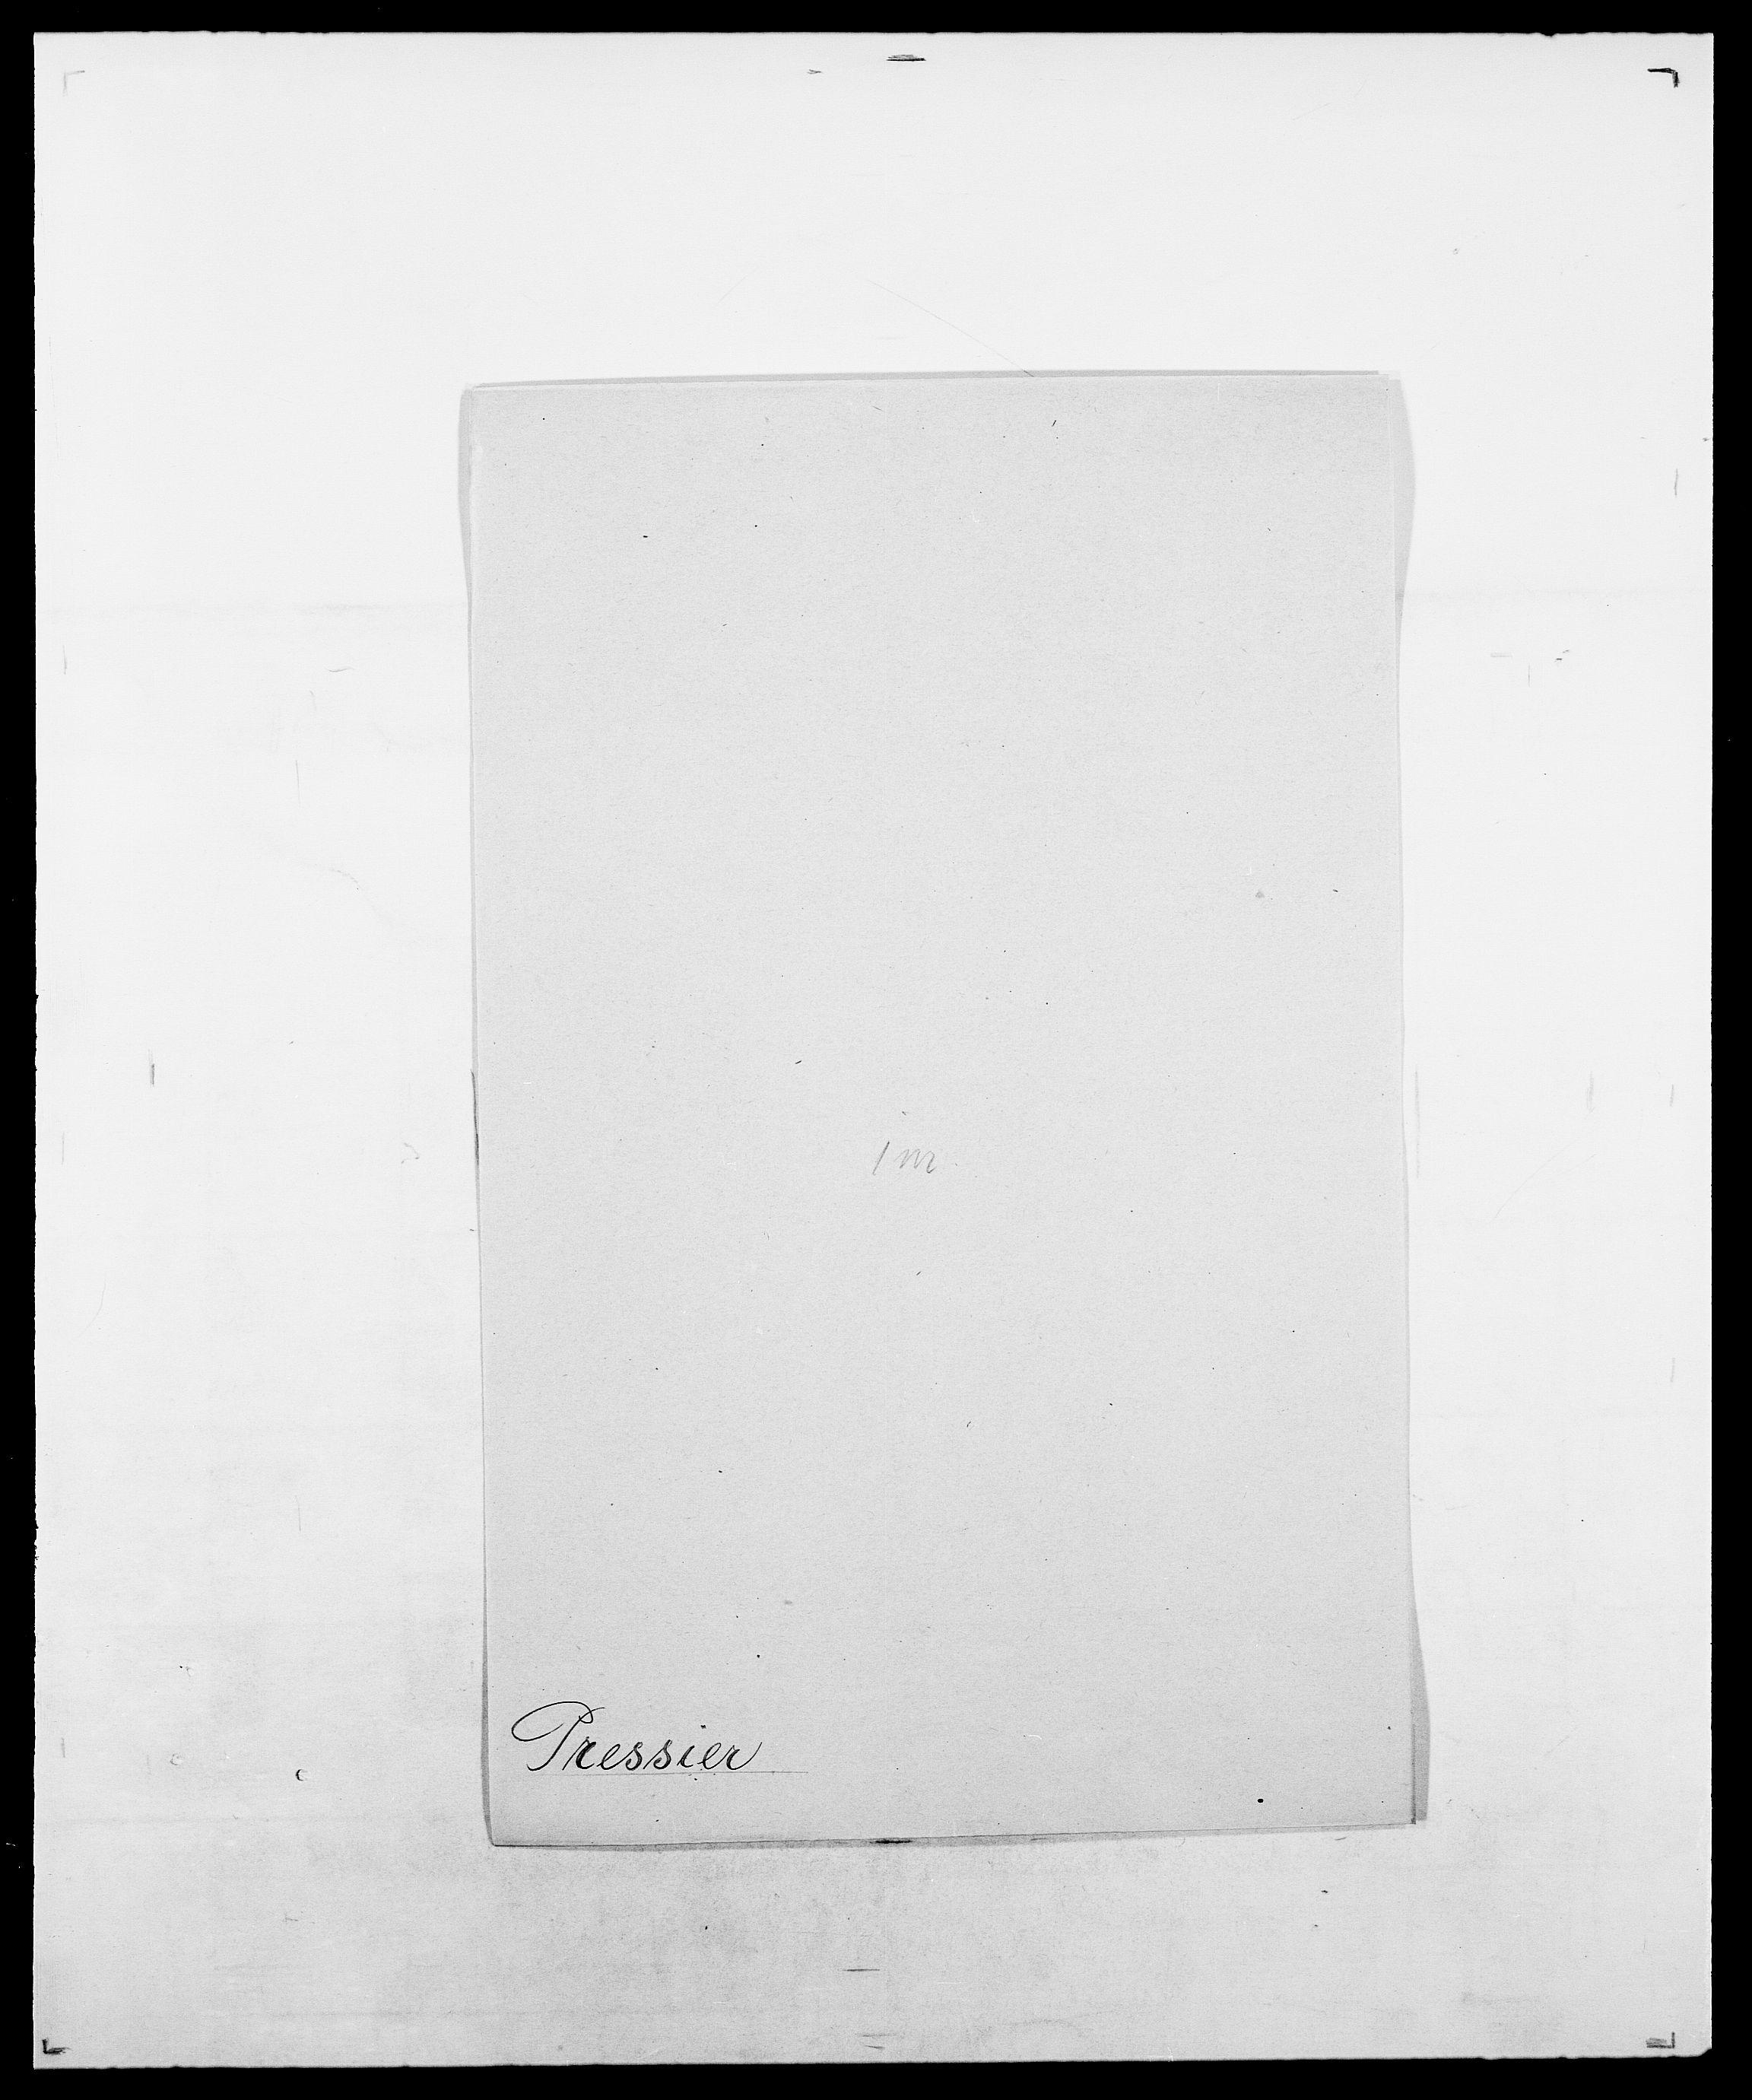 SAO, Delgobe, Charles Antoine - samling, D/Da/L0031: de Place - Raaum, s. 317